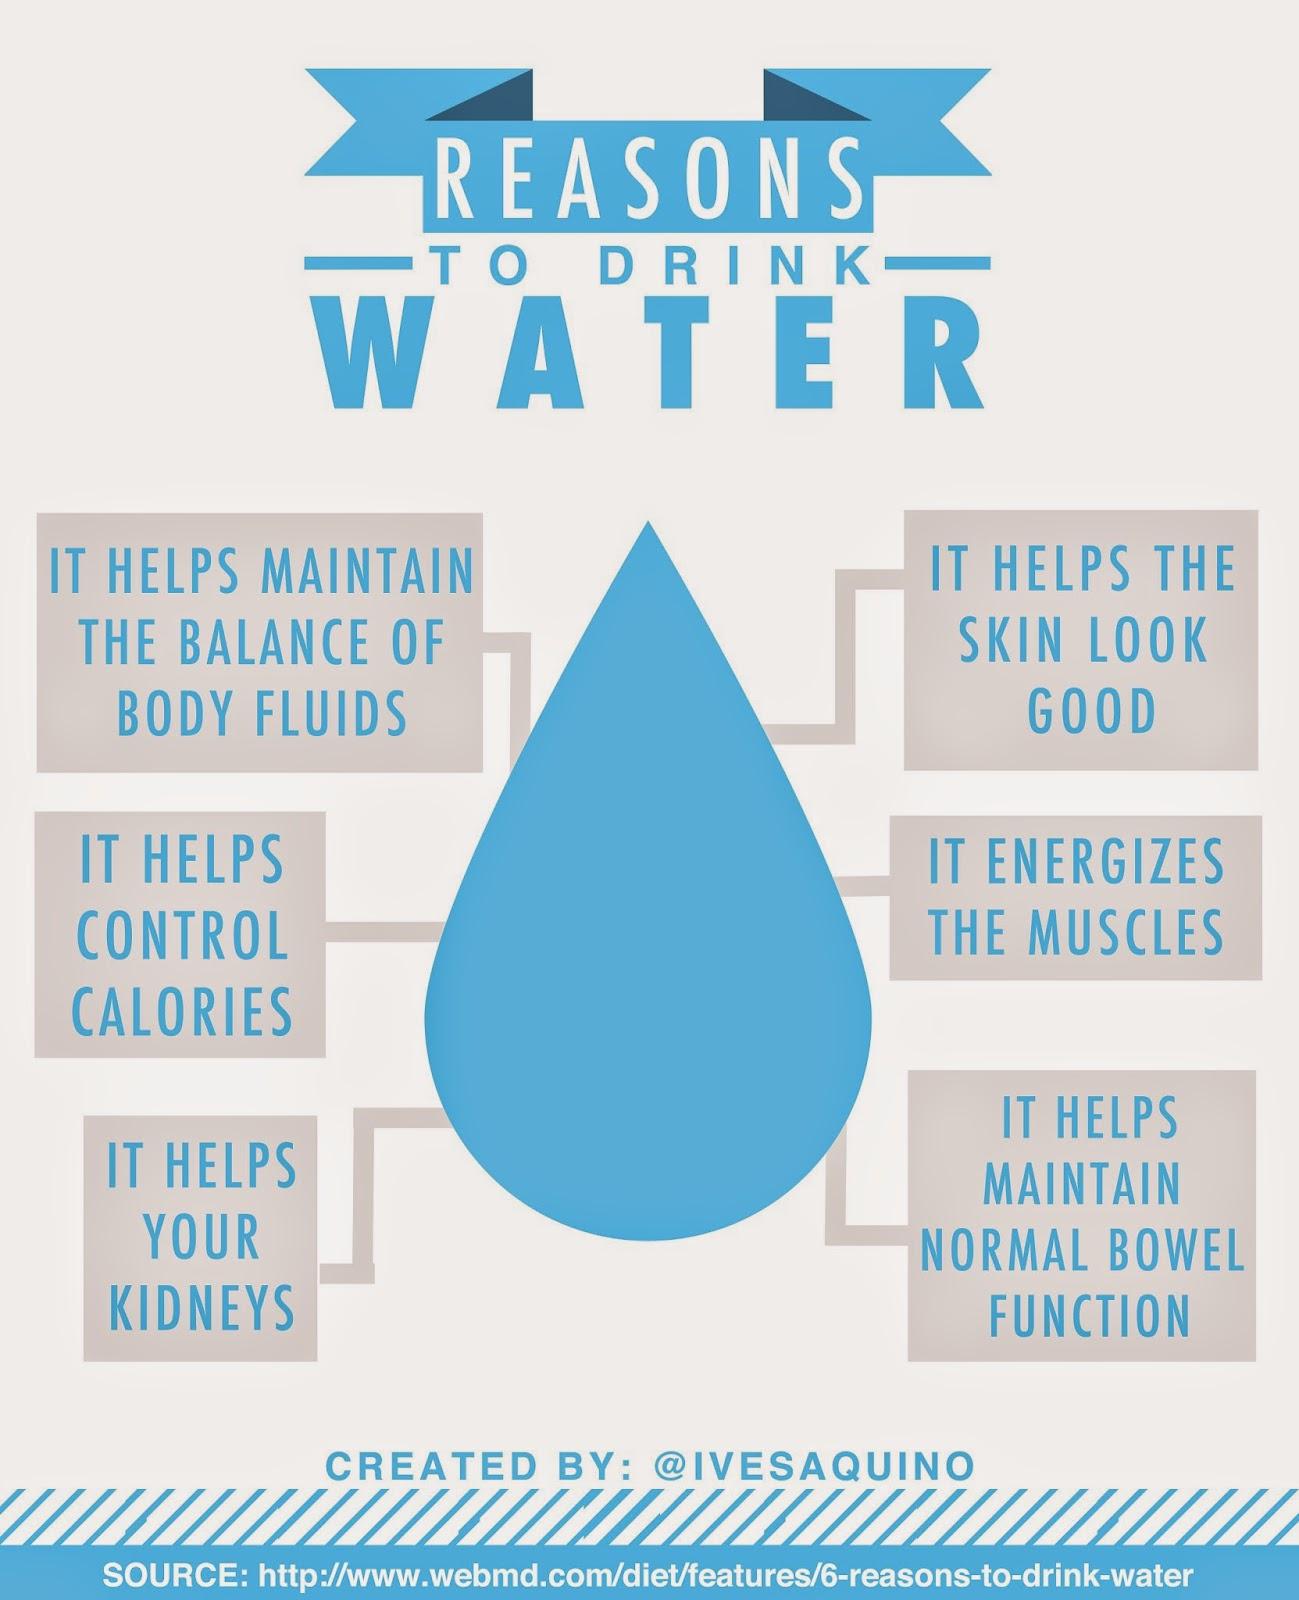 menjaga keseimbangan air, mengontrol kalori, menjaga ginjal dan kandung kemih, mempercantik kulit dan memberi energi otot